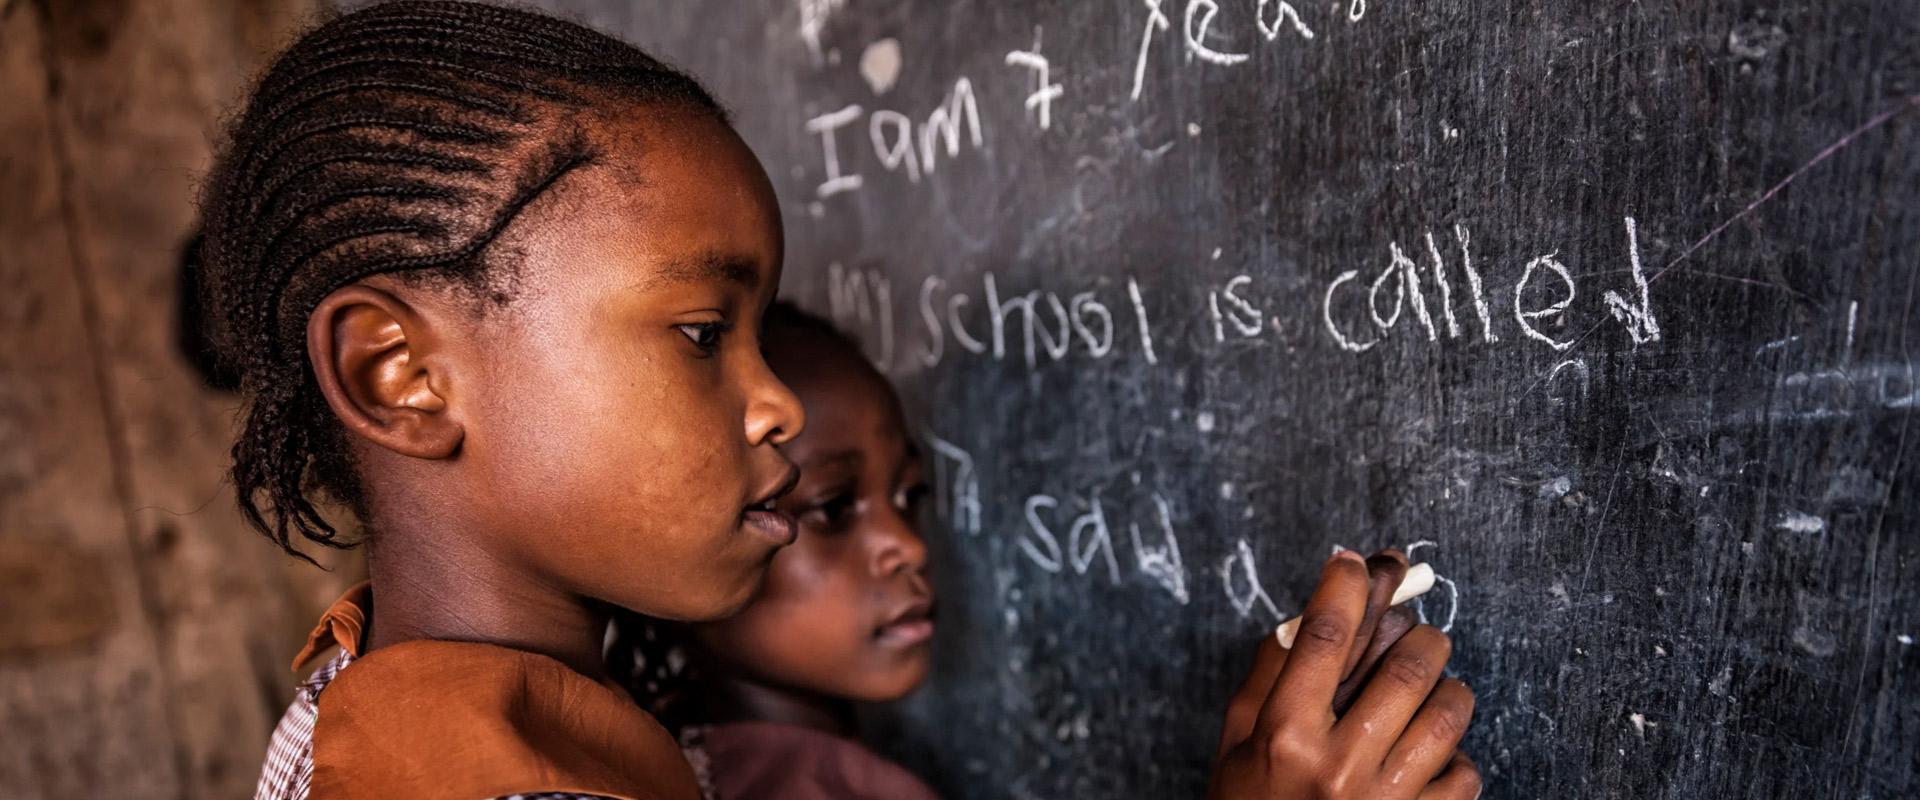 Learn Swahili Words